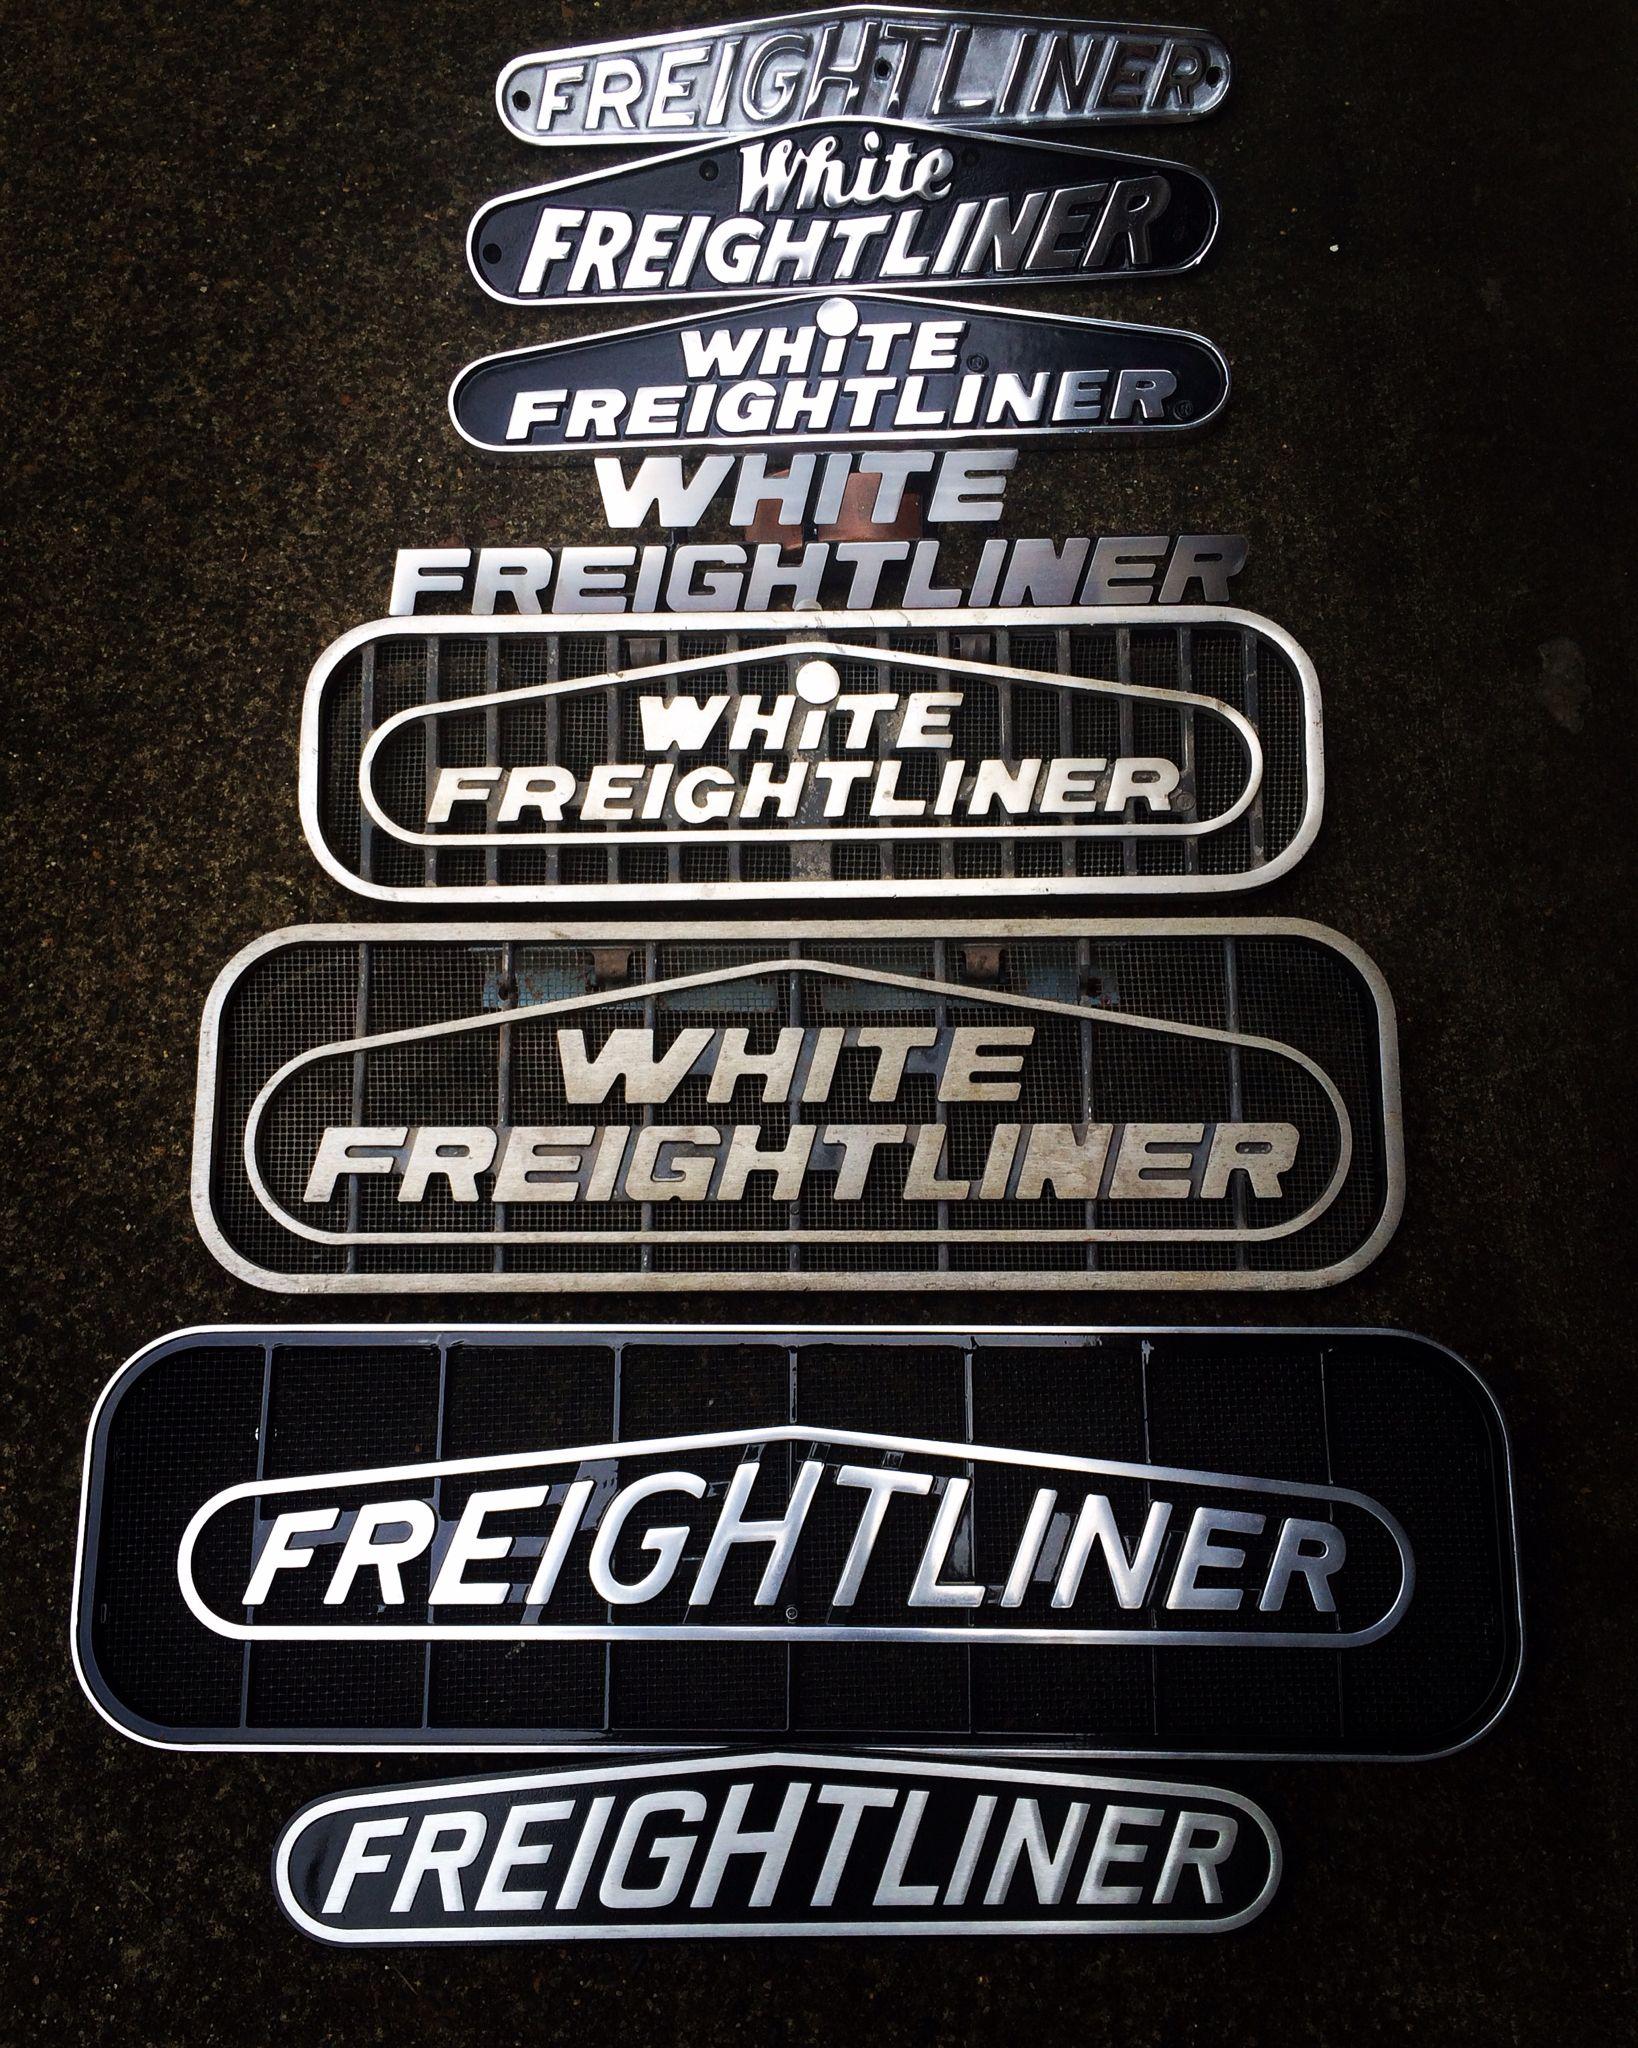 Part Of My White Freightliner Freightliner Emblem Collection Freightliner Trucks Freightliner Big Trucks